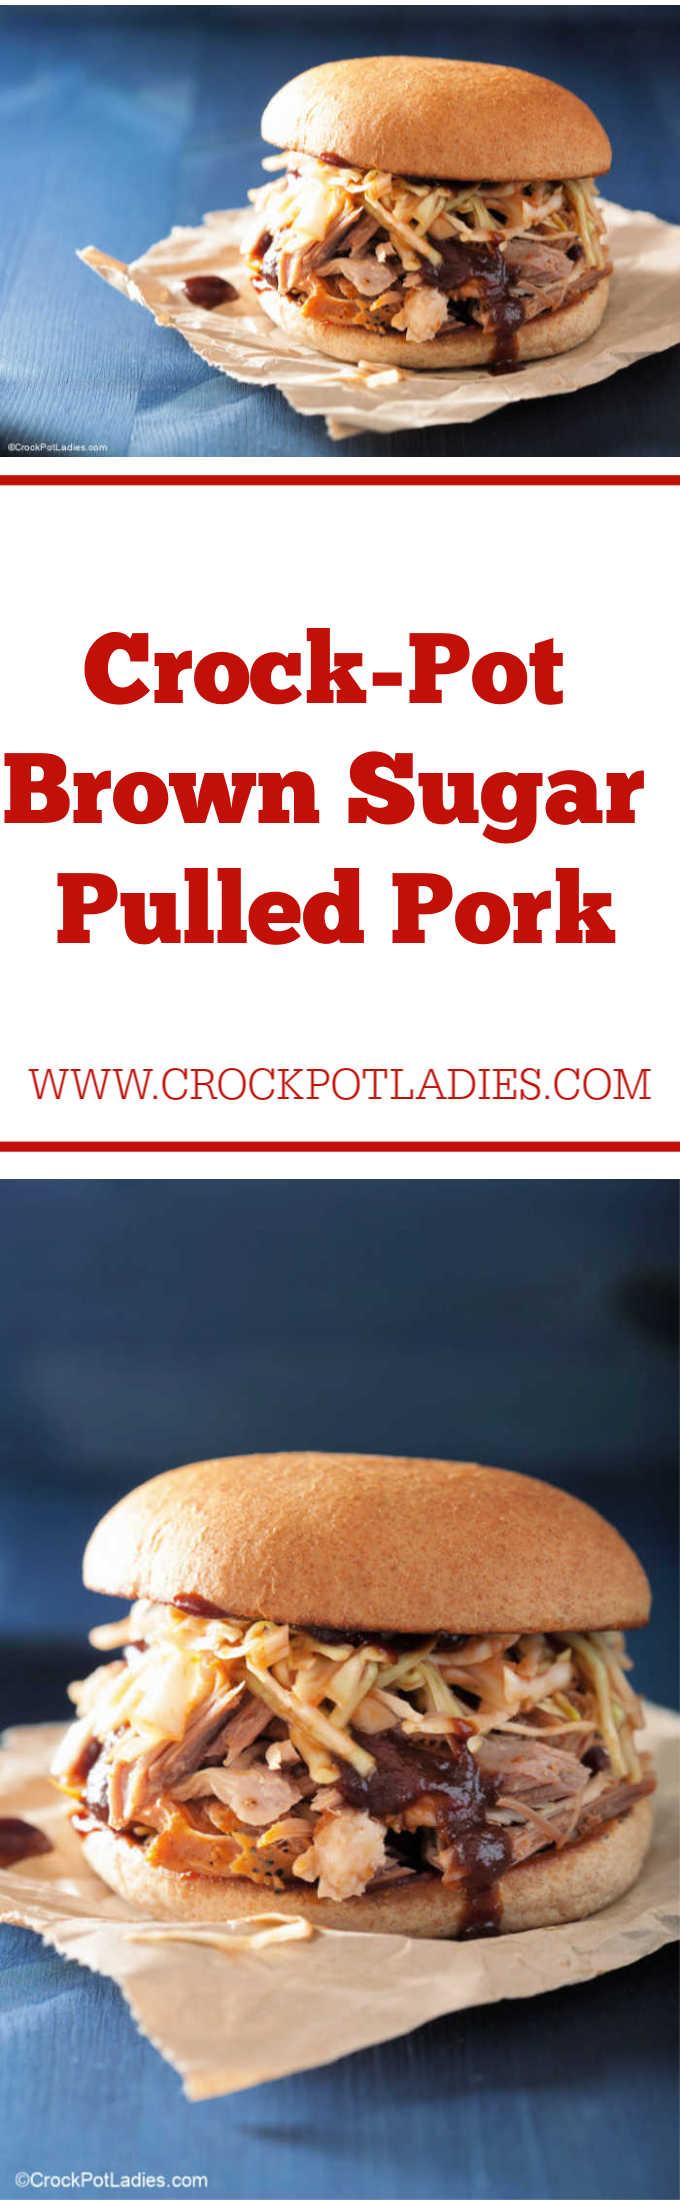 Crock-Pot Brown Sugar Pulled Pork